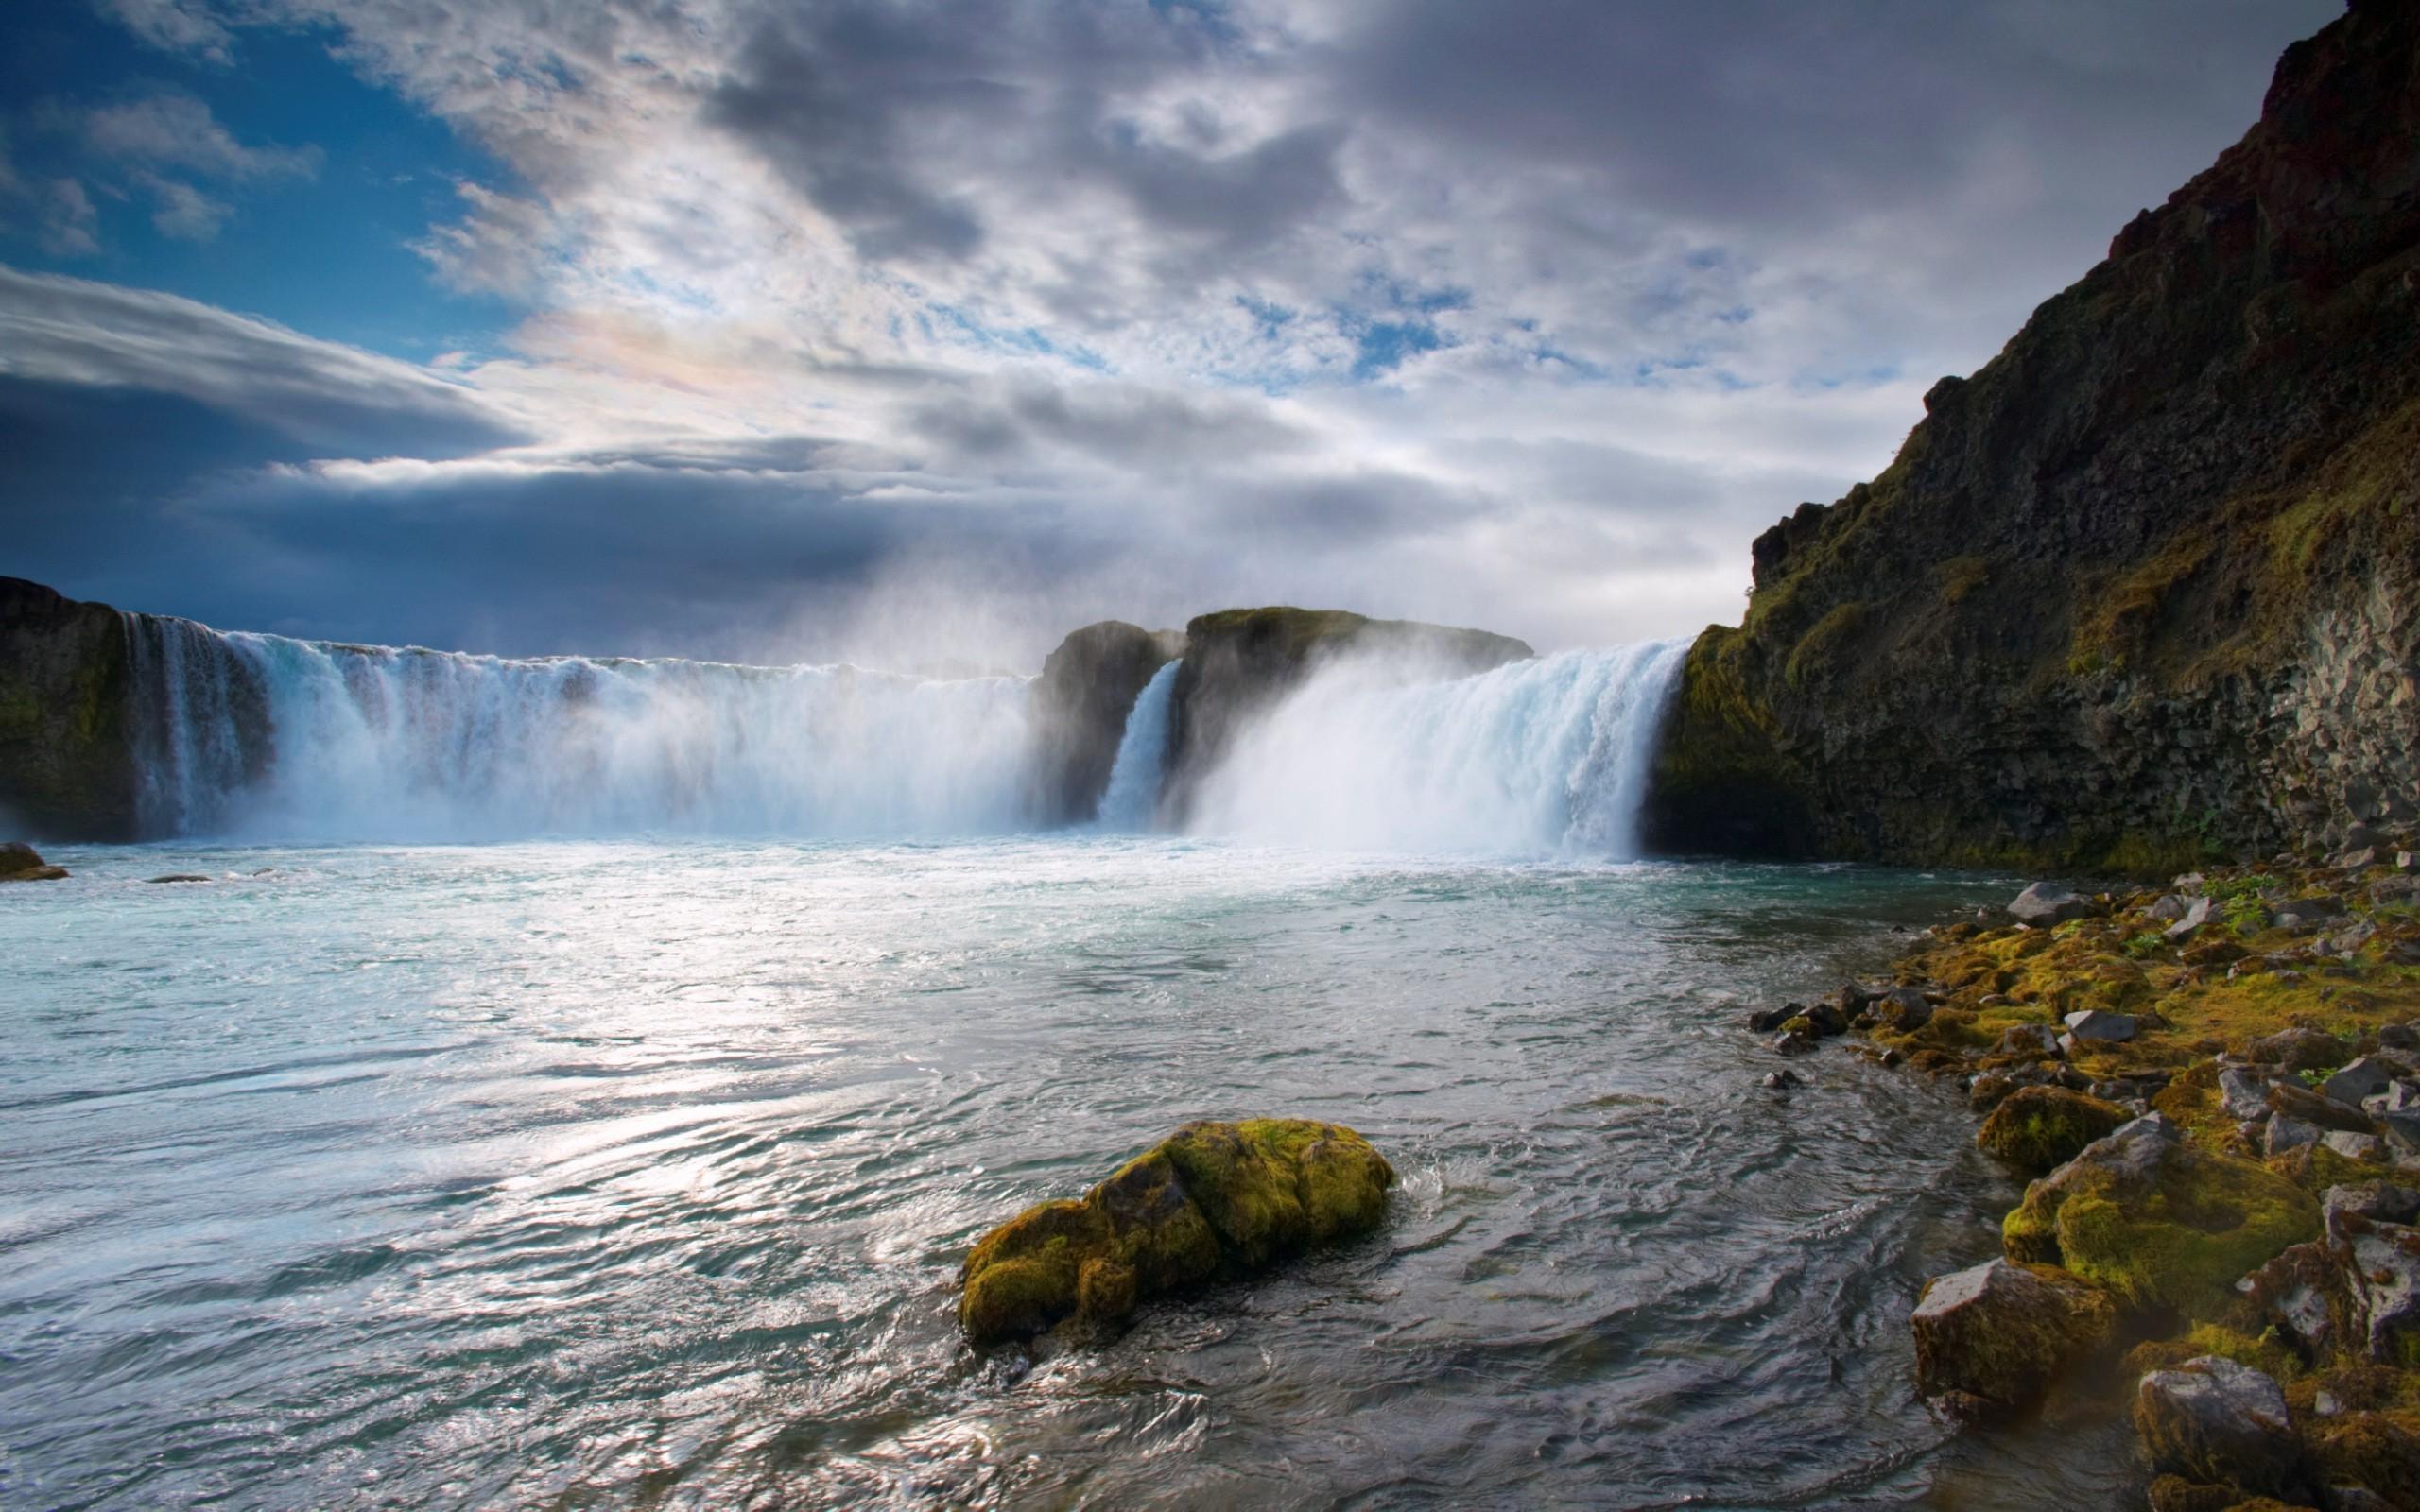 1440p Wallpaper Girls Nature Landscape Iceland Waterfall Wallpapers Hd